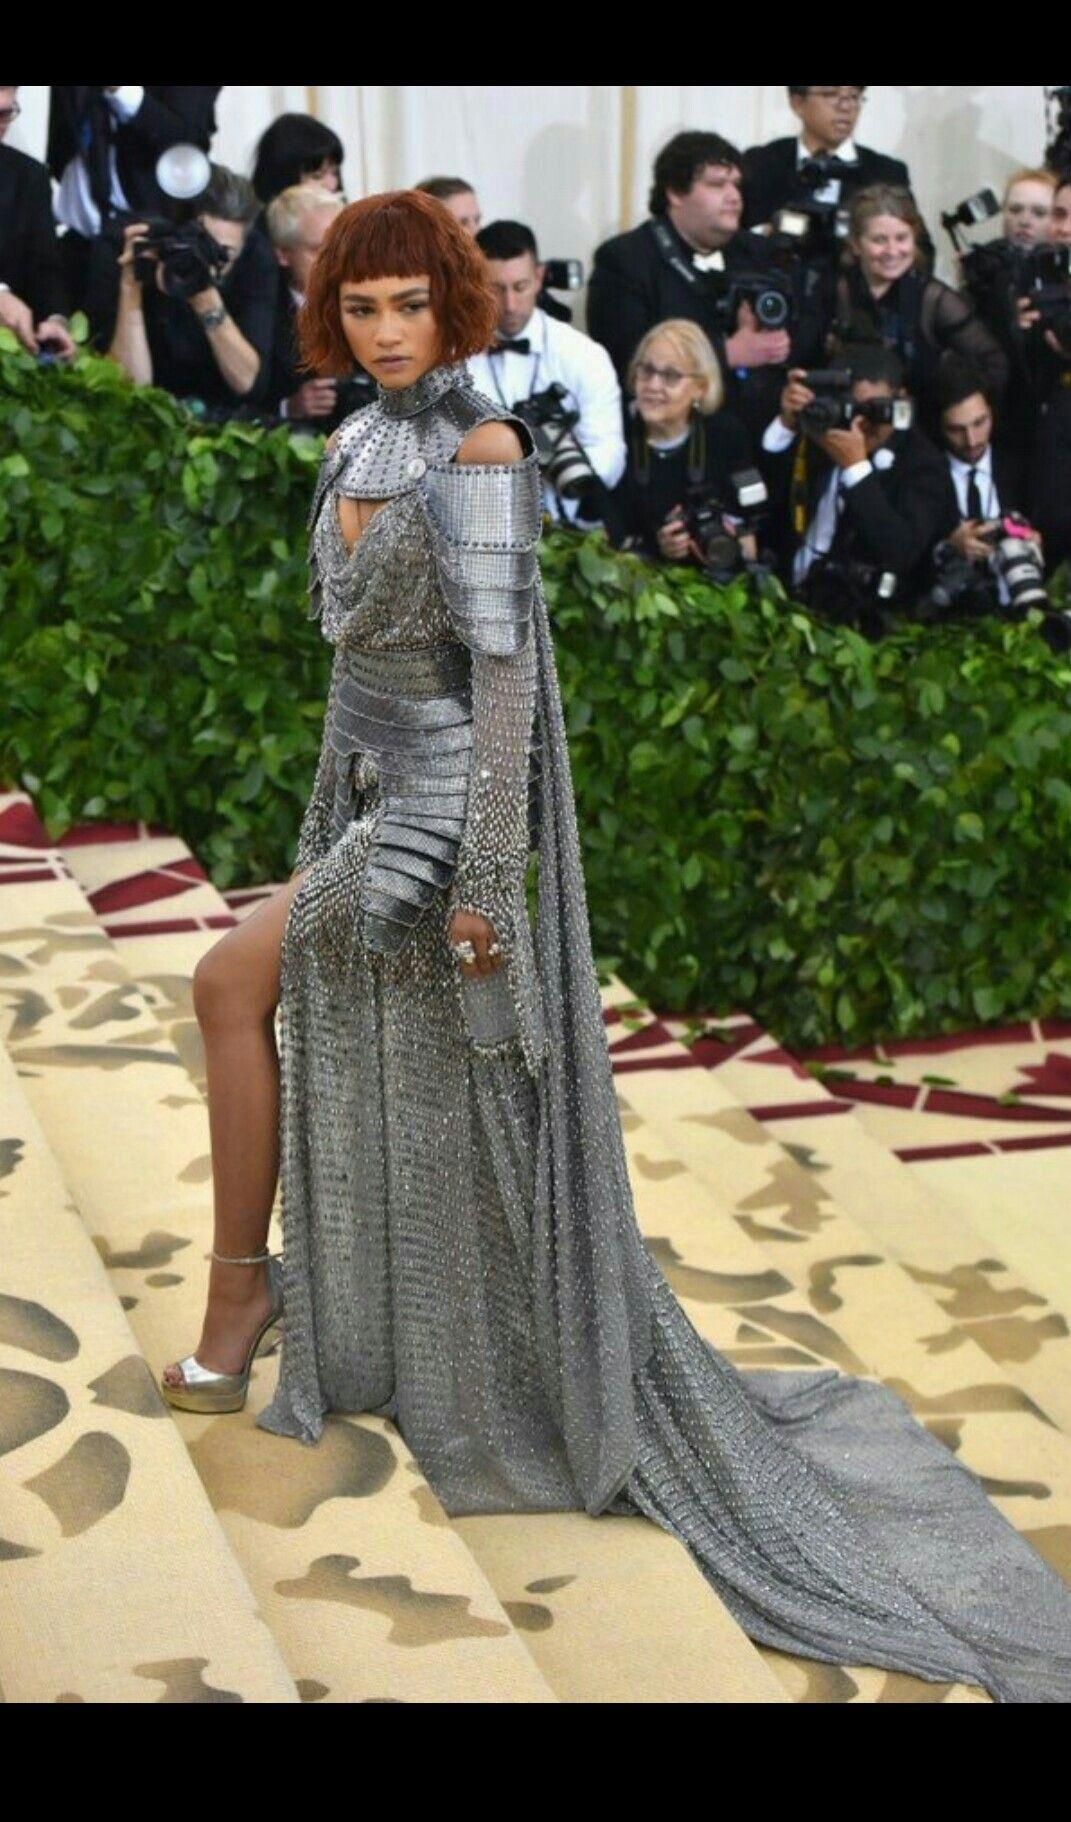 Metgala zendaya in versace if i ever walk the red carpet